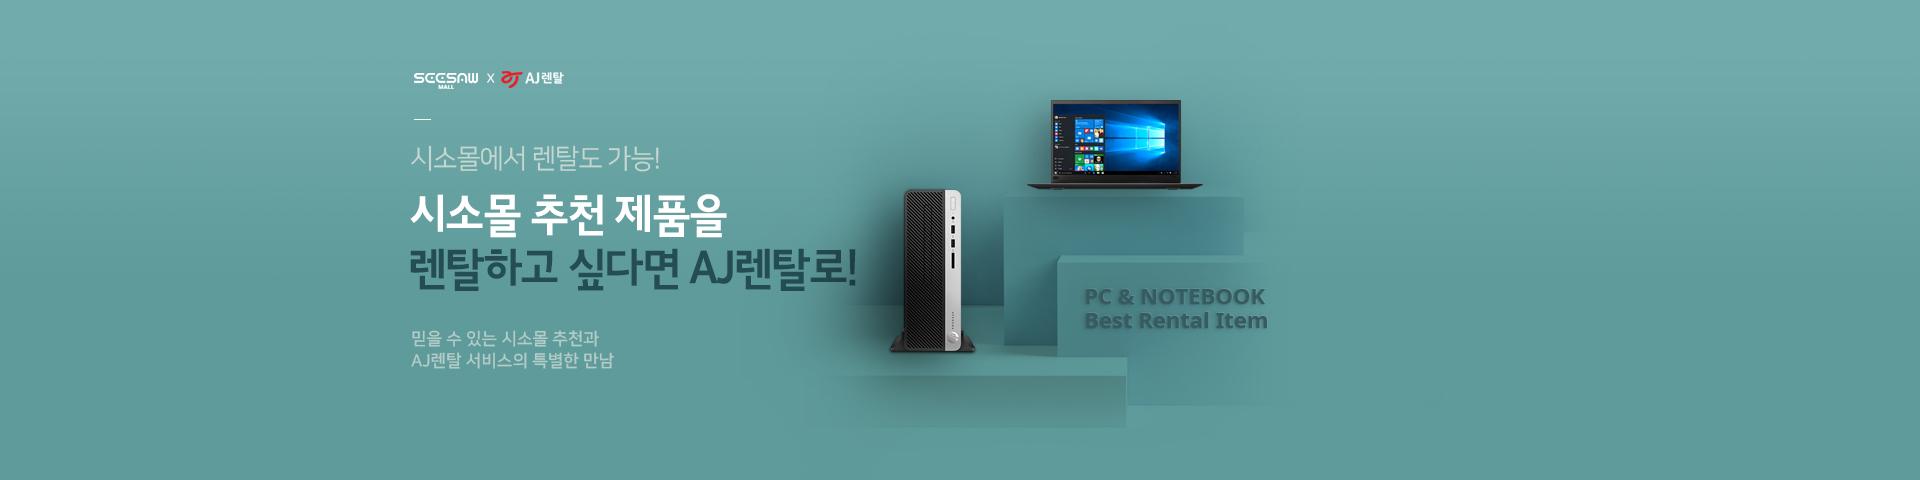 [AJ렌탈] PC / 노트북 렌탈 기획전